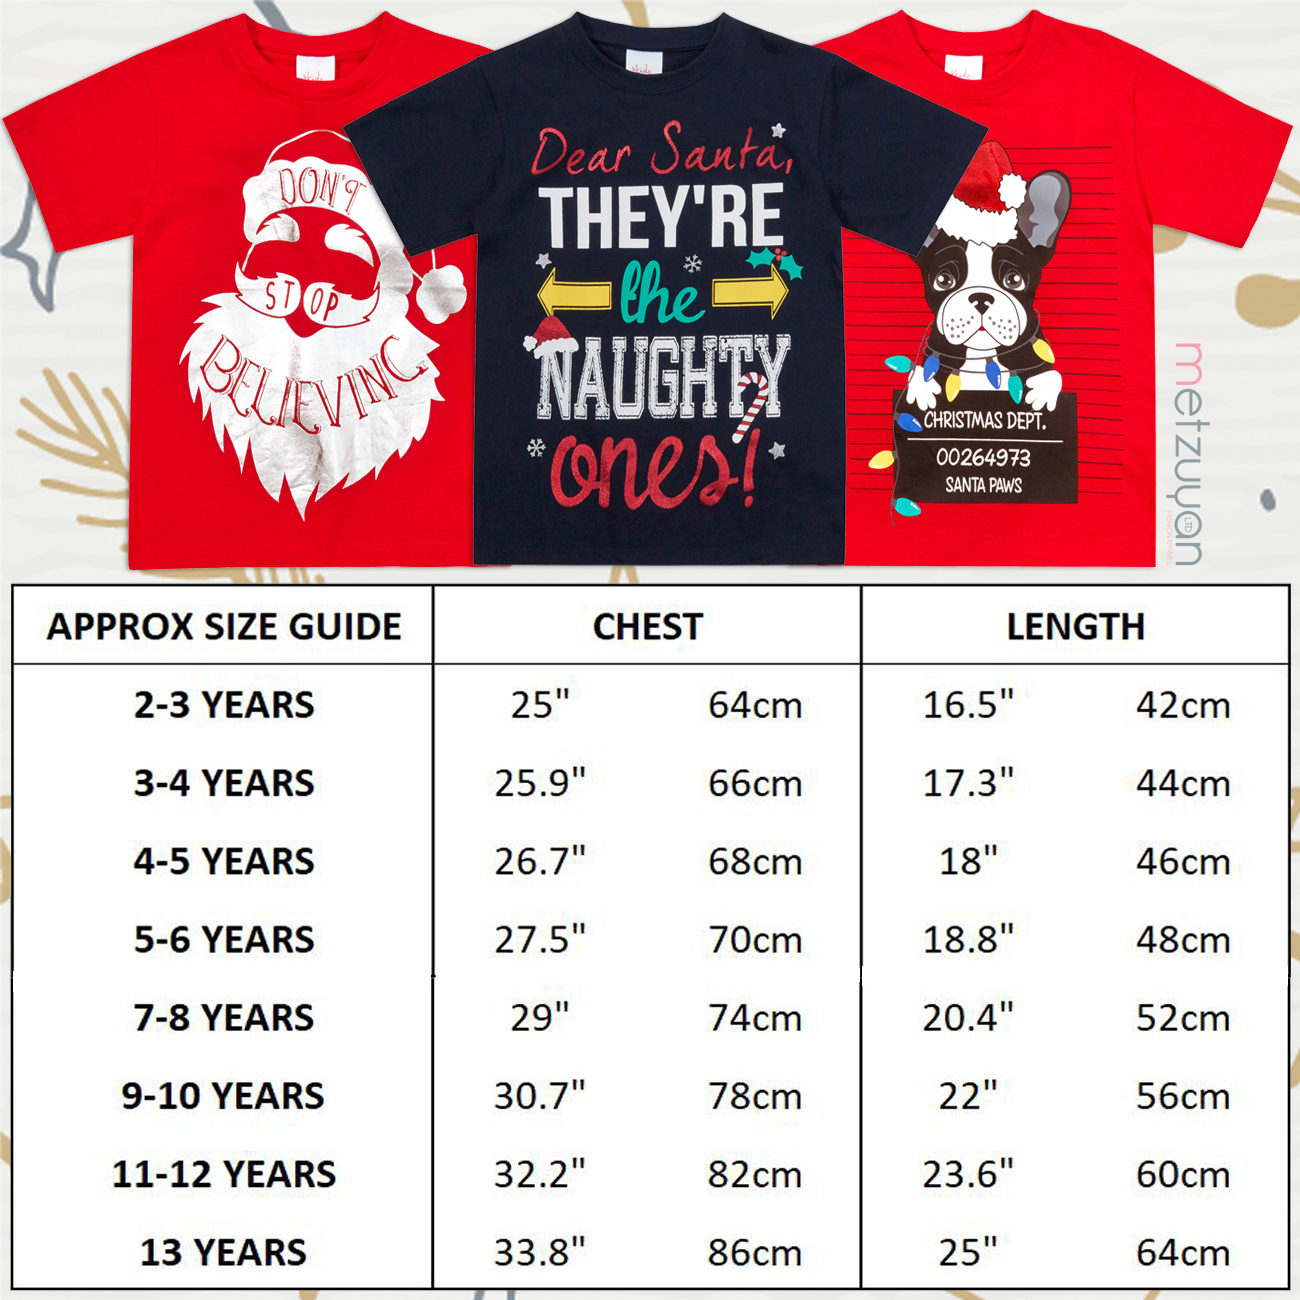 Childrens-Girls-Boys-Xmas-T-Shirts-Printed-Christmas-Design-100-Cotton-2-13-Yrs thumbnail 29